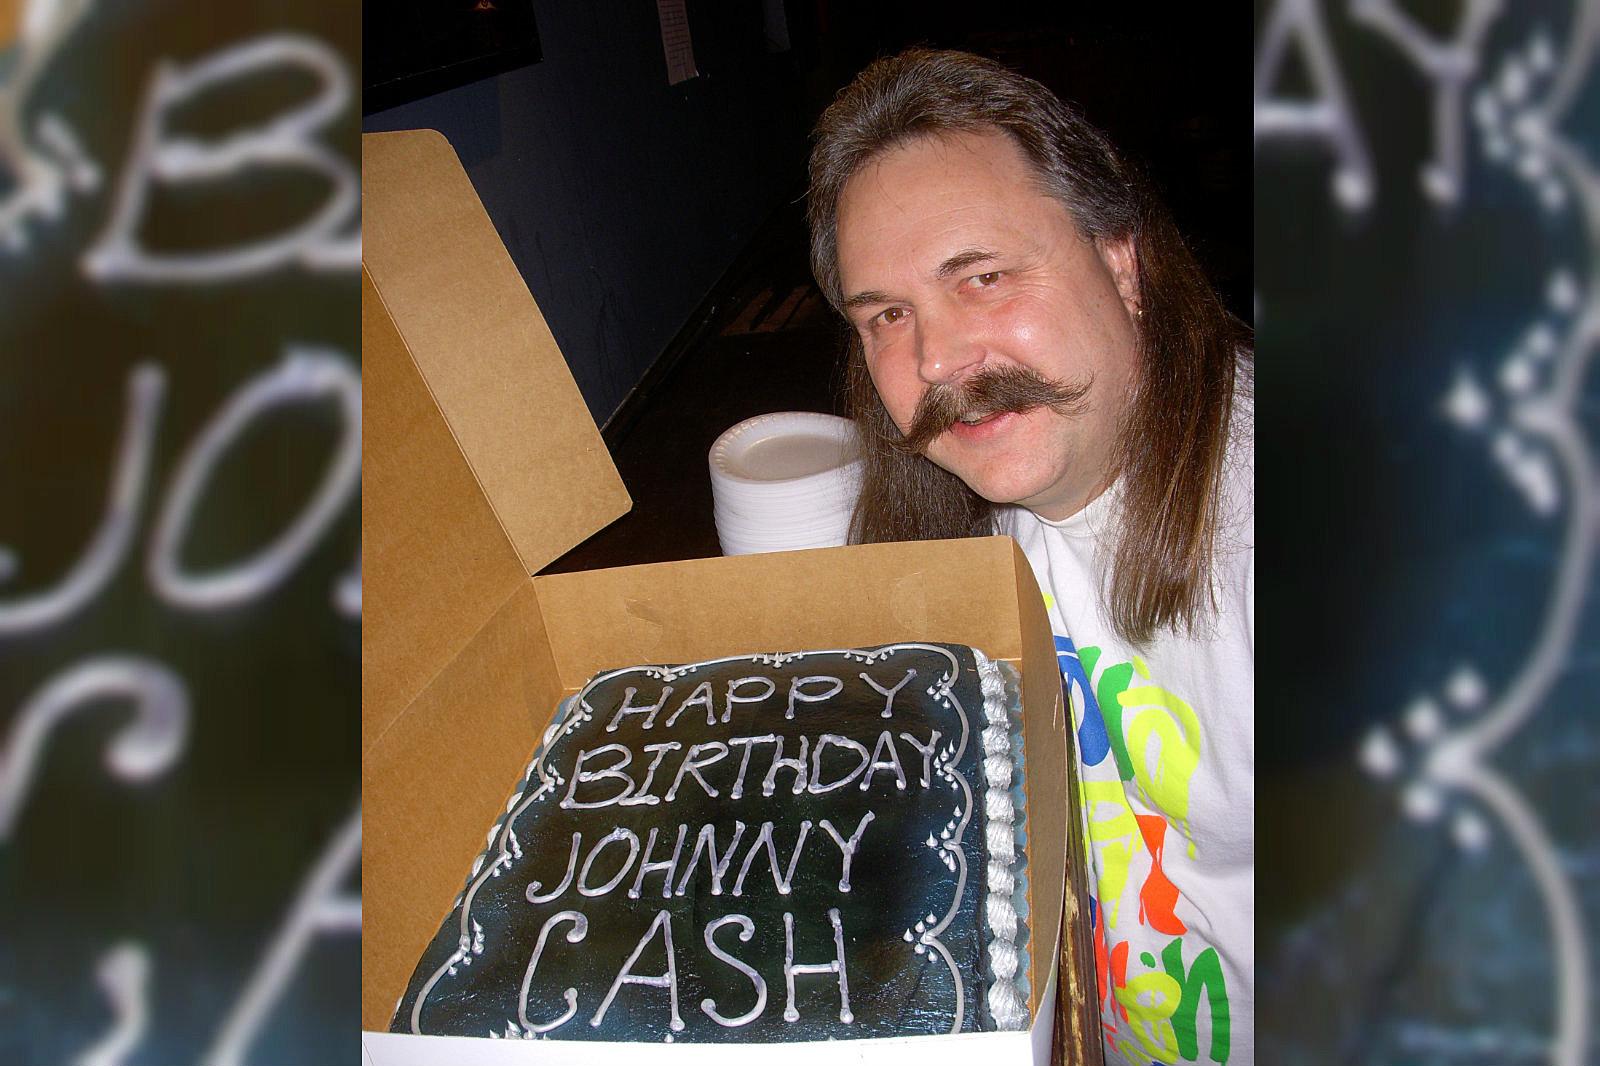 Best Western Colorado Places To Celebrate Johnny Cashs Birthday